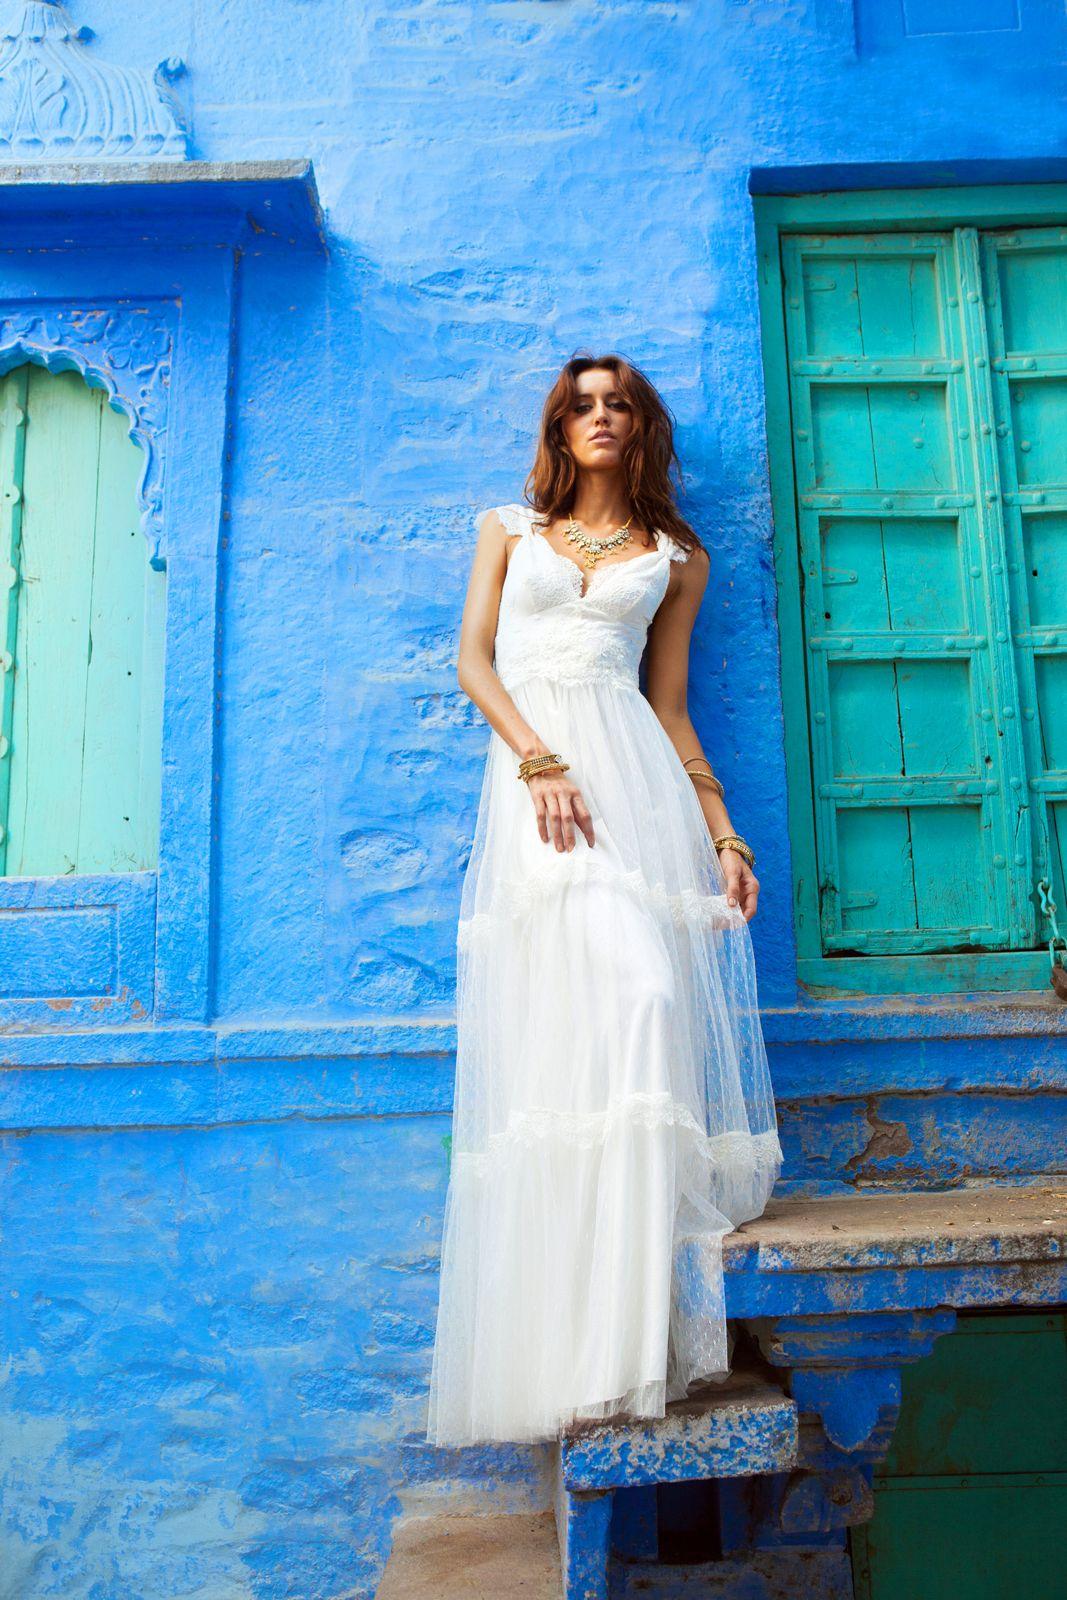 Blue camo wedding dresses  graceloveslacecharlieg  pixels  Boho Chic Bride